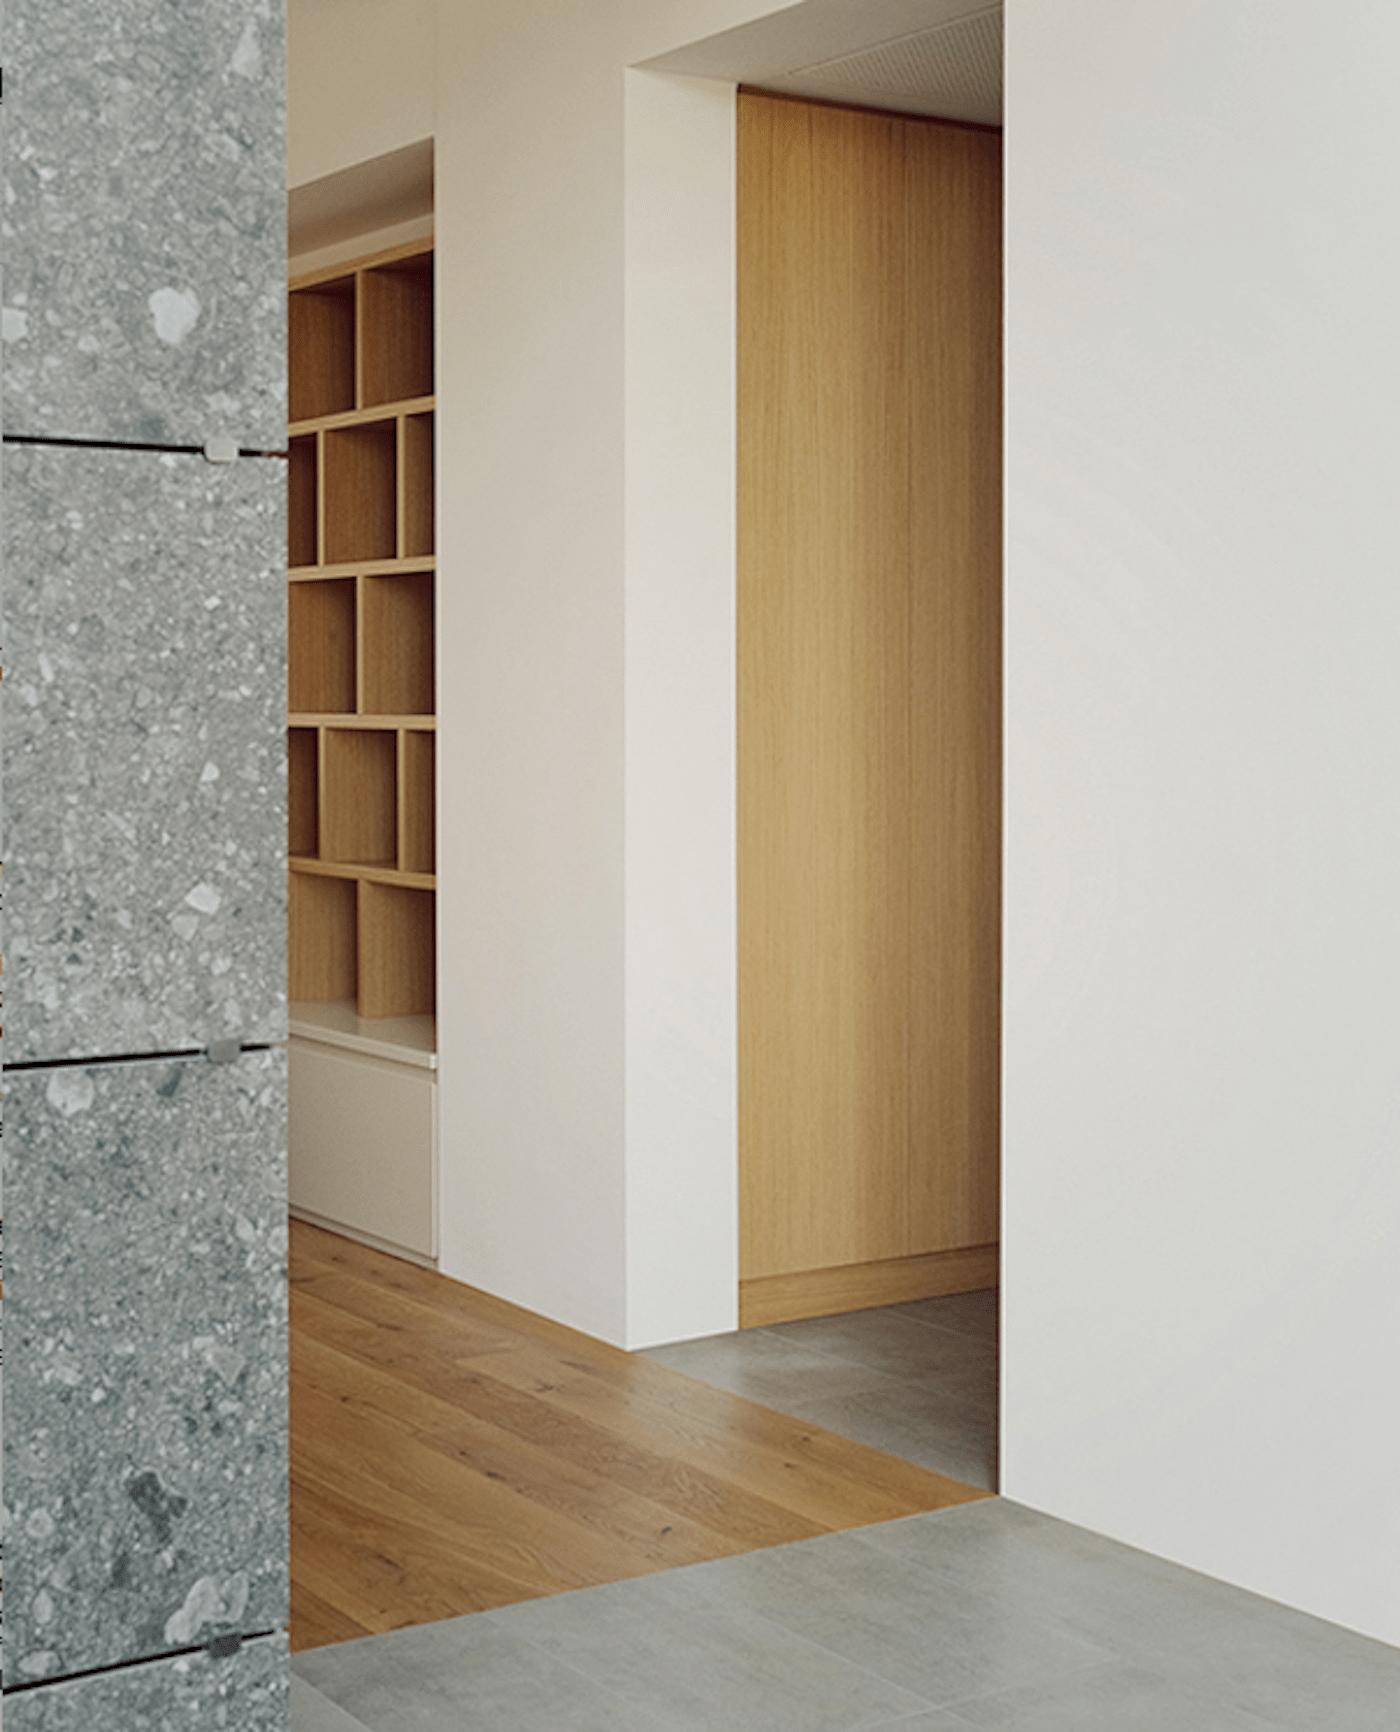 Stone wall cladding timber door